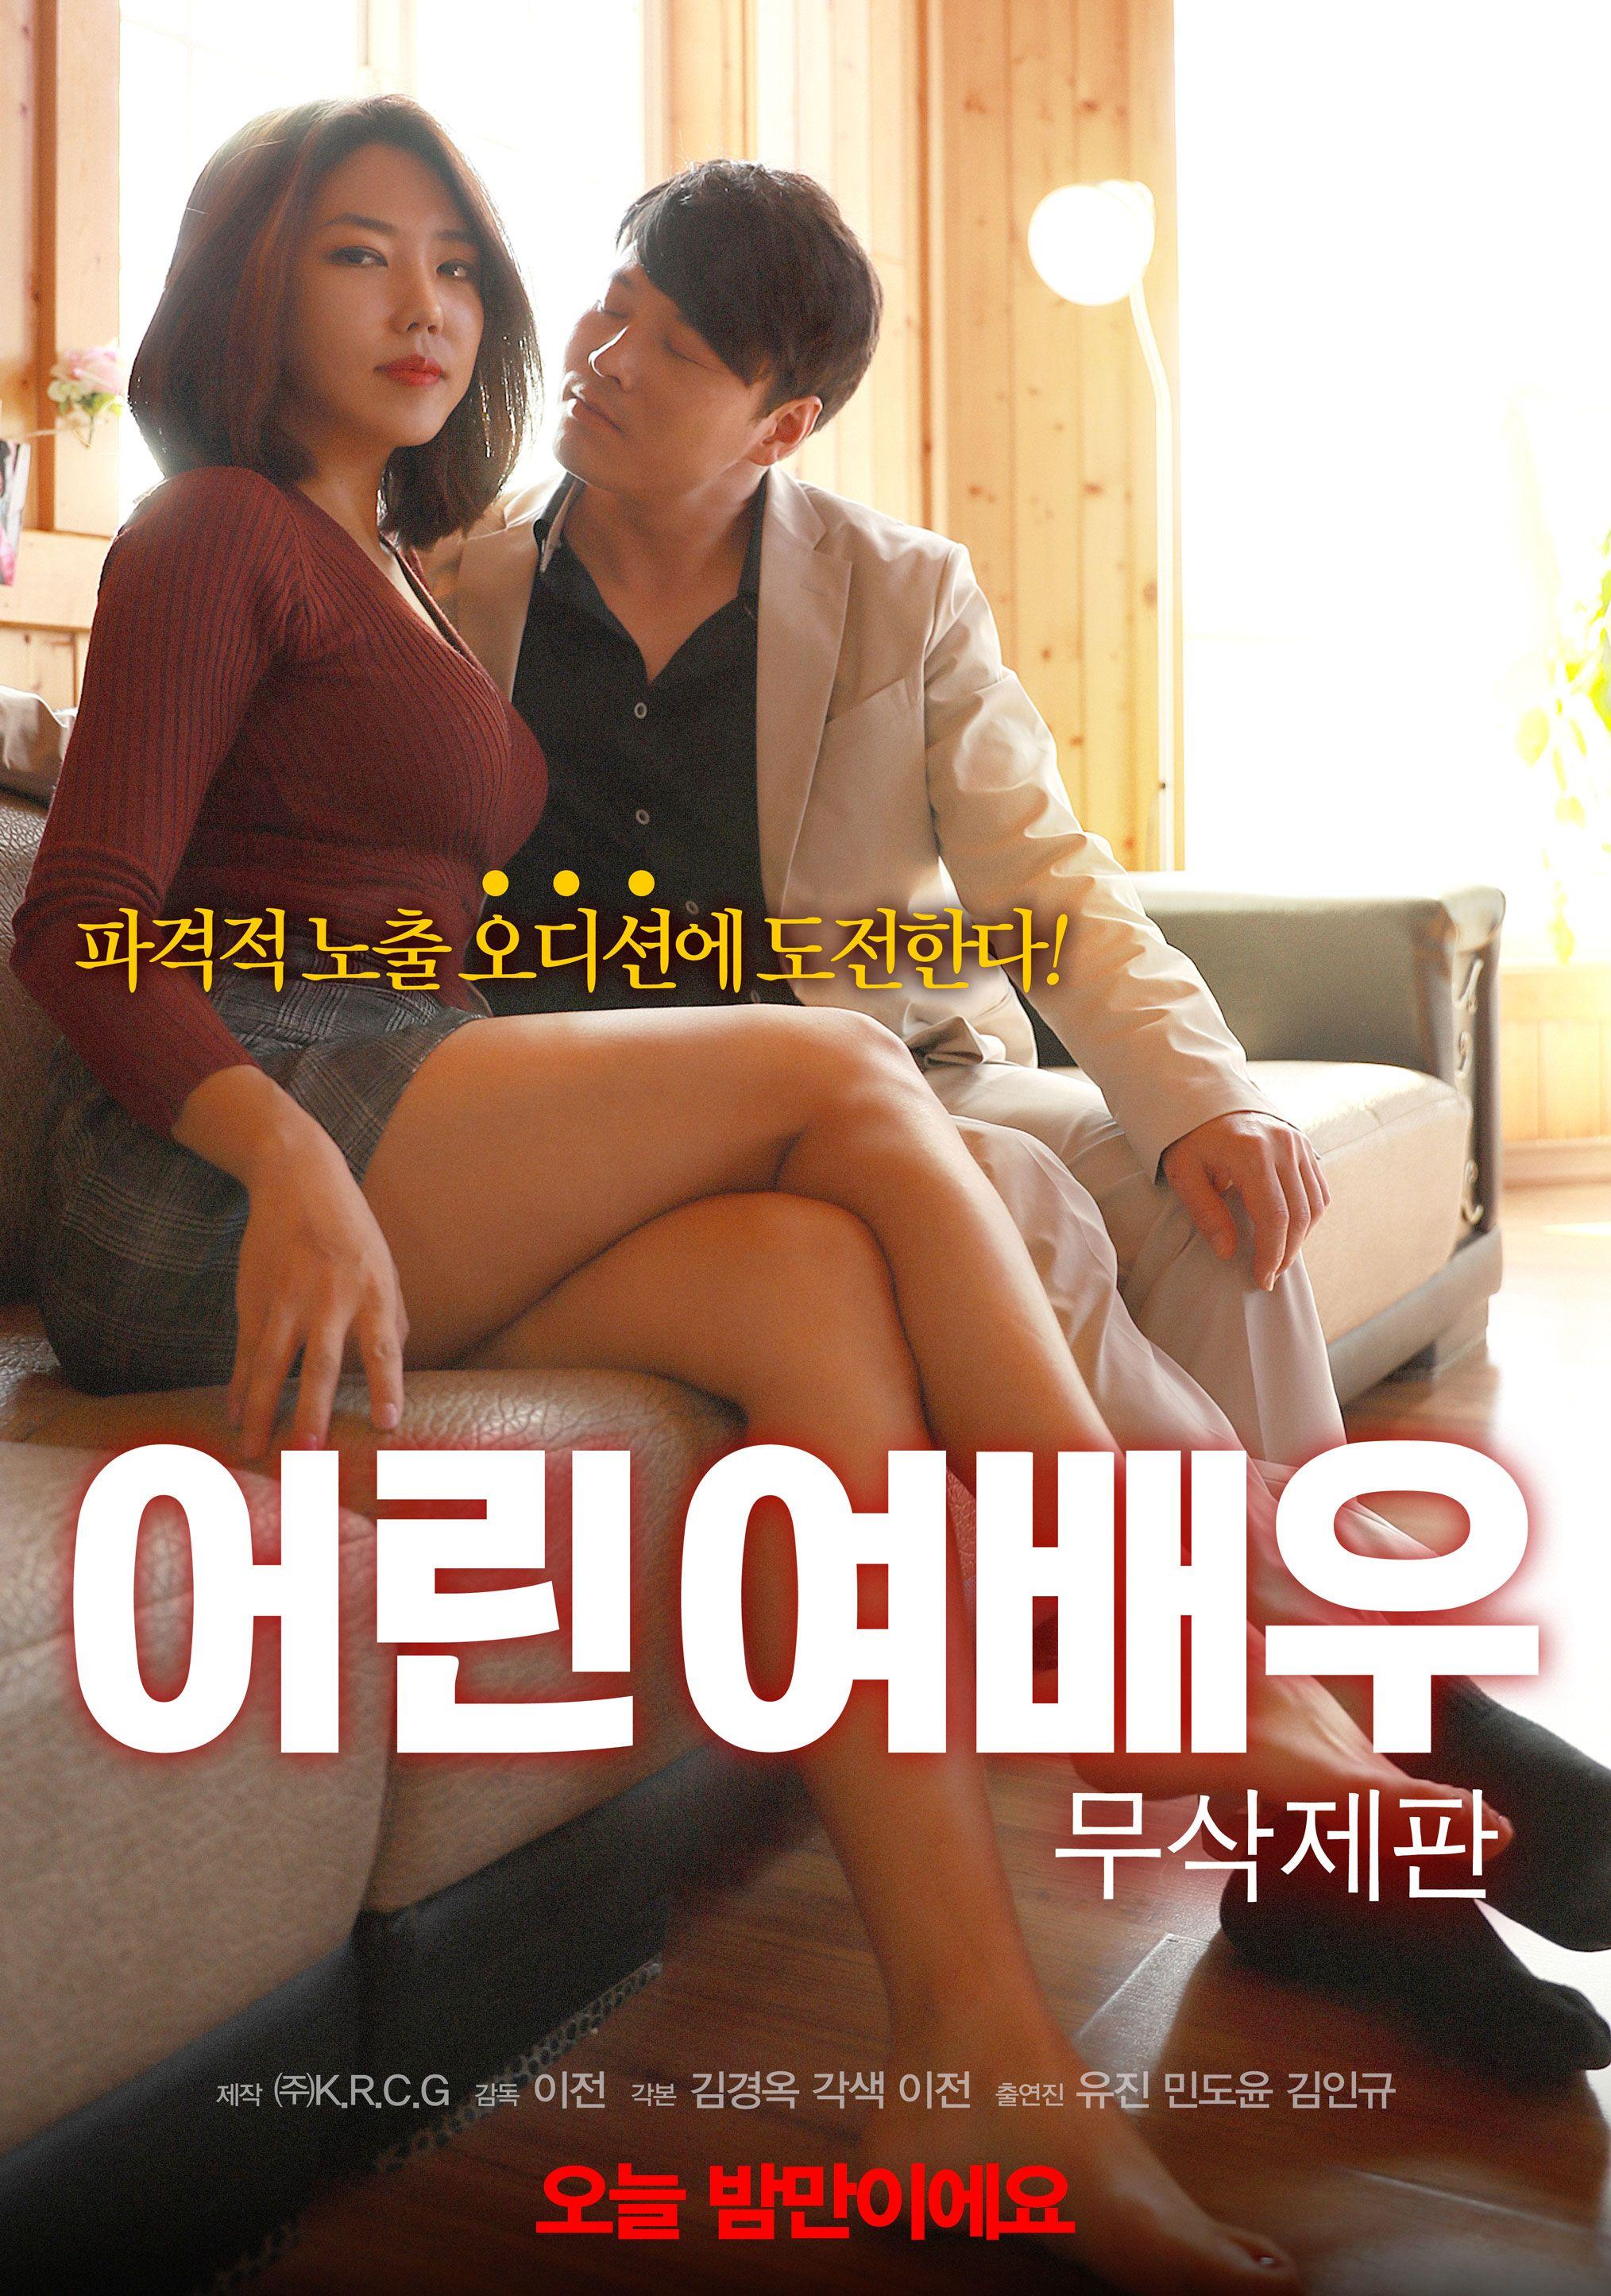 Young Actress 어린 여배우 2018 Film Baru Bioskop Film